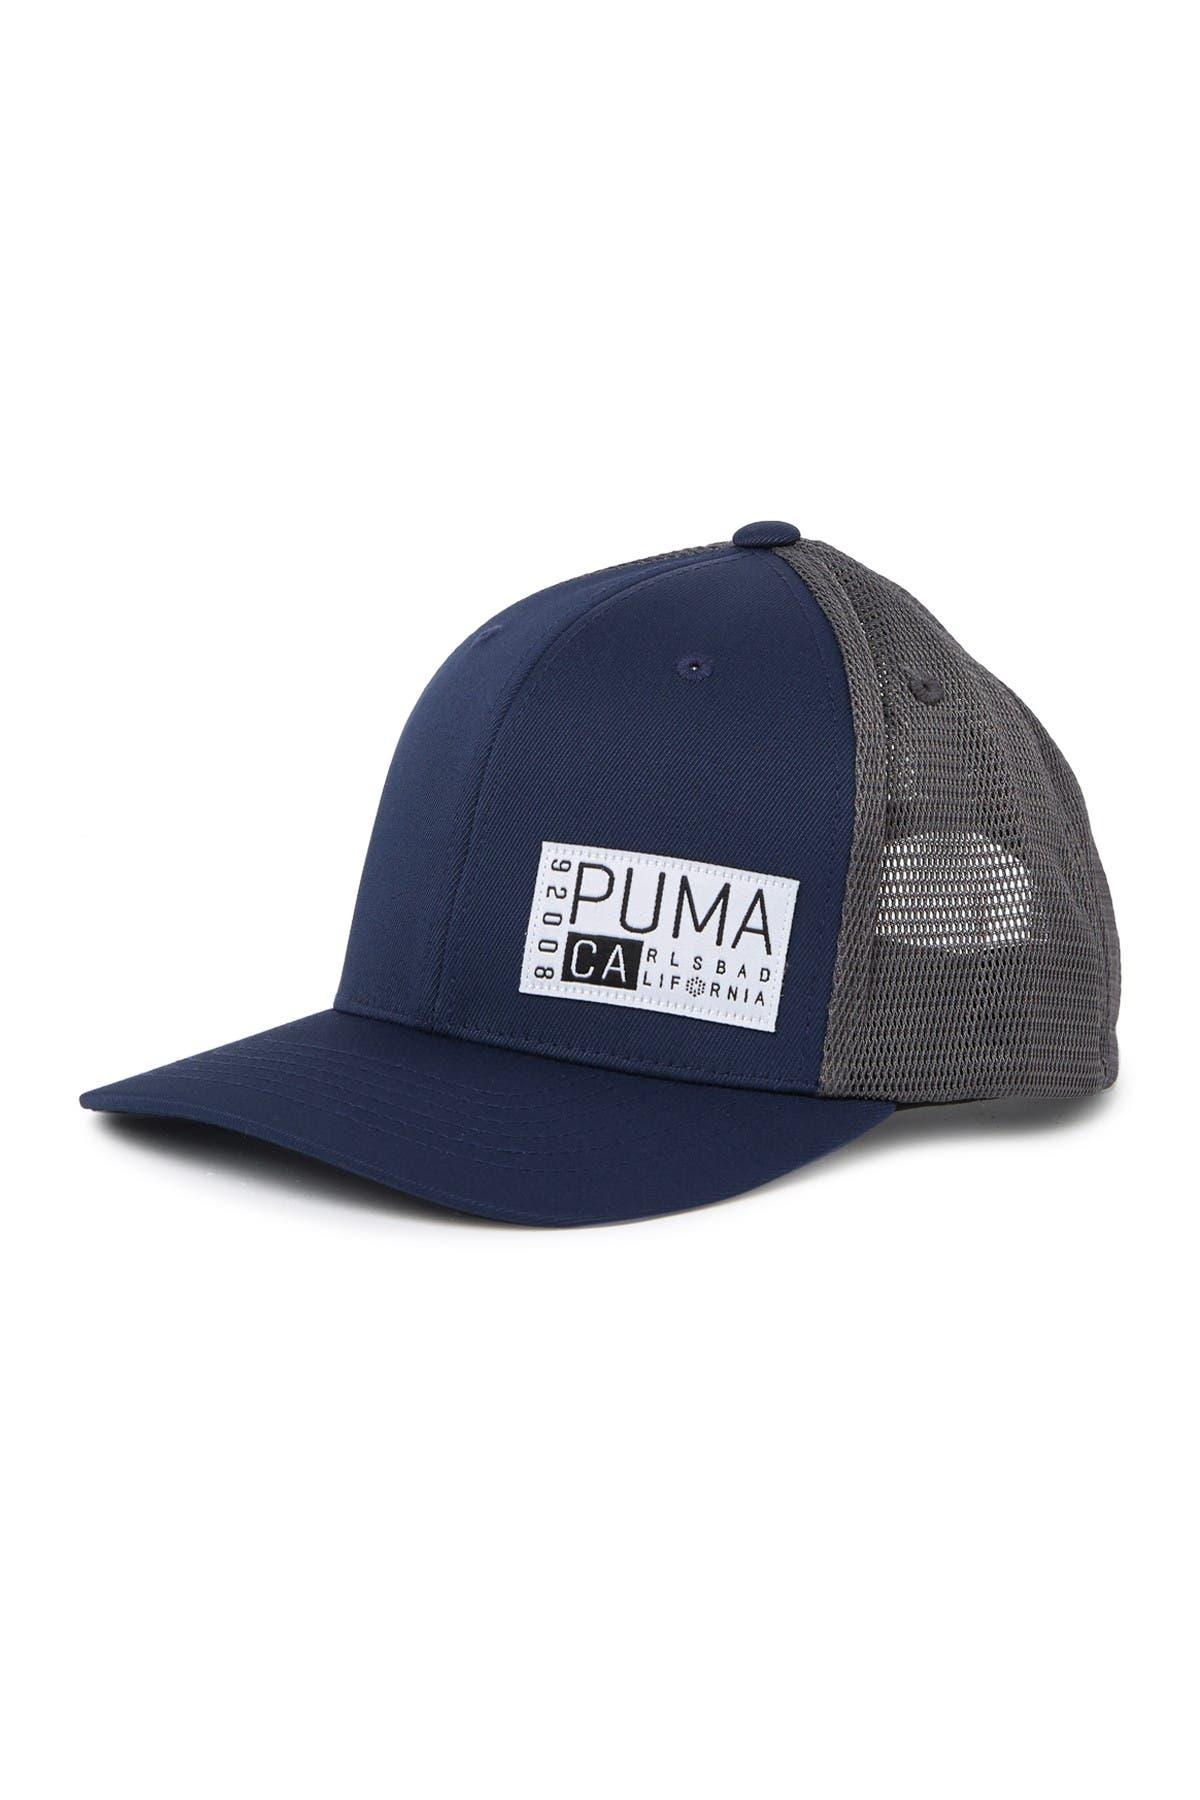 Image of PUMA GOLF Utility Patch Trucker Snapback Cap